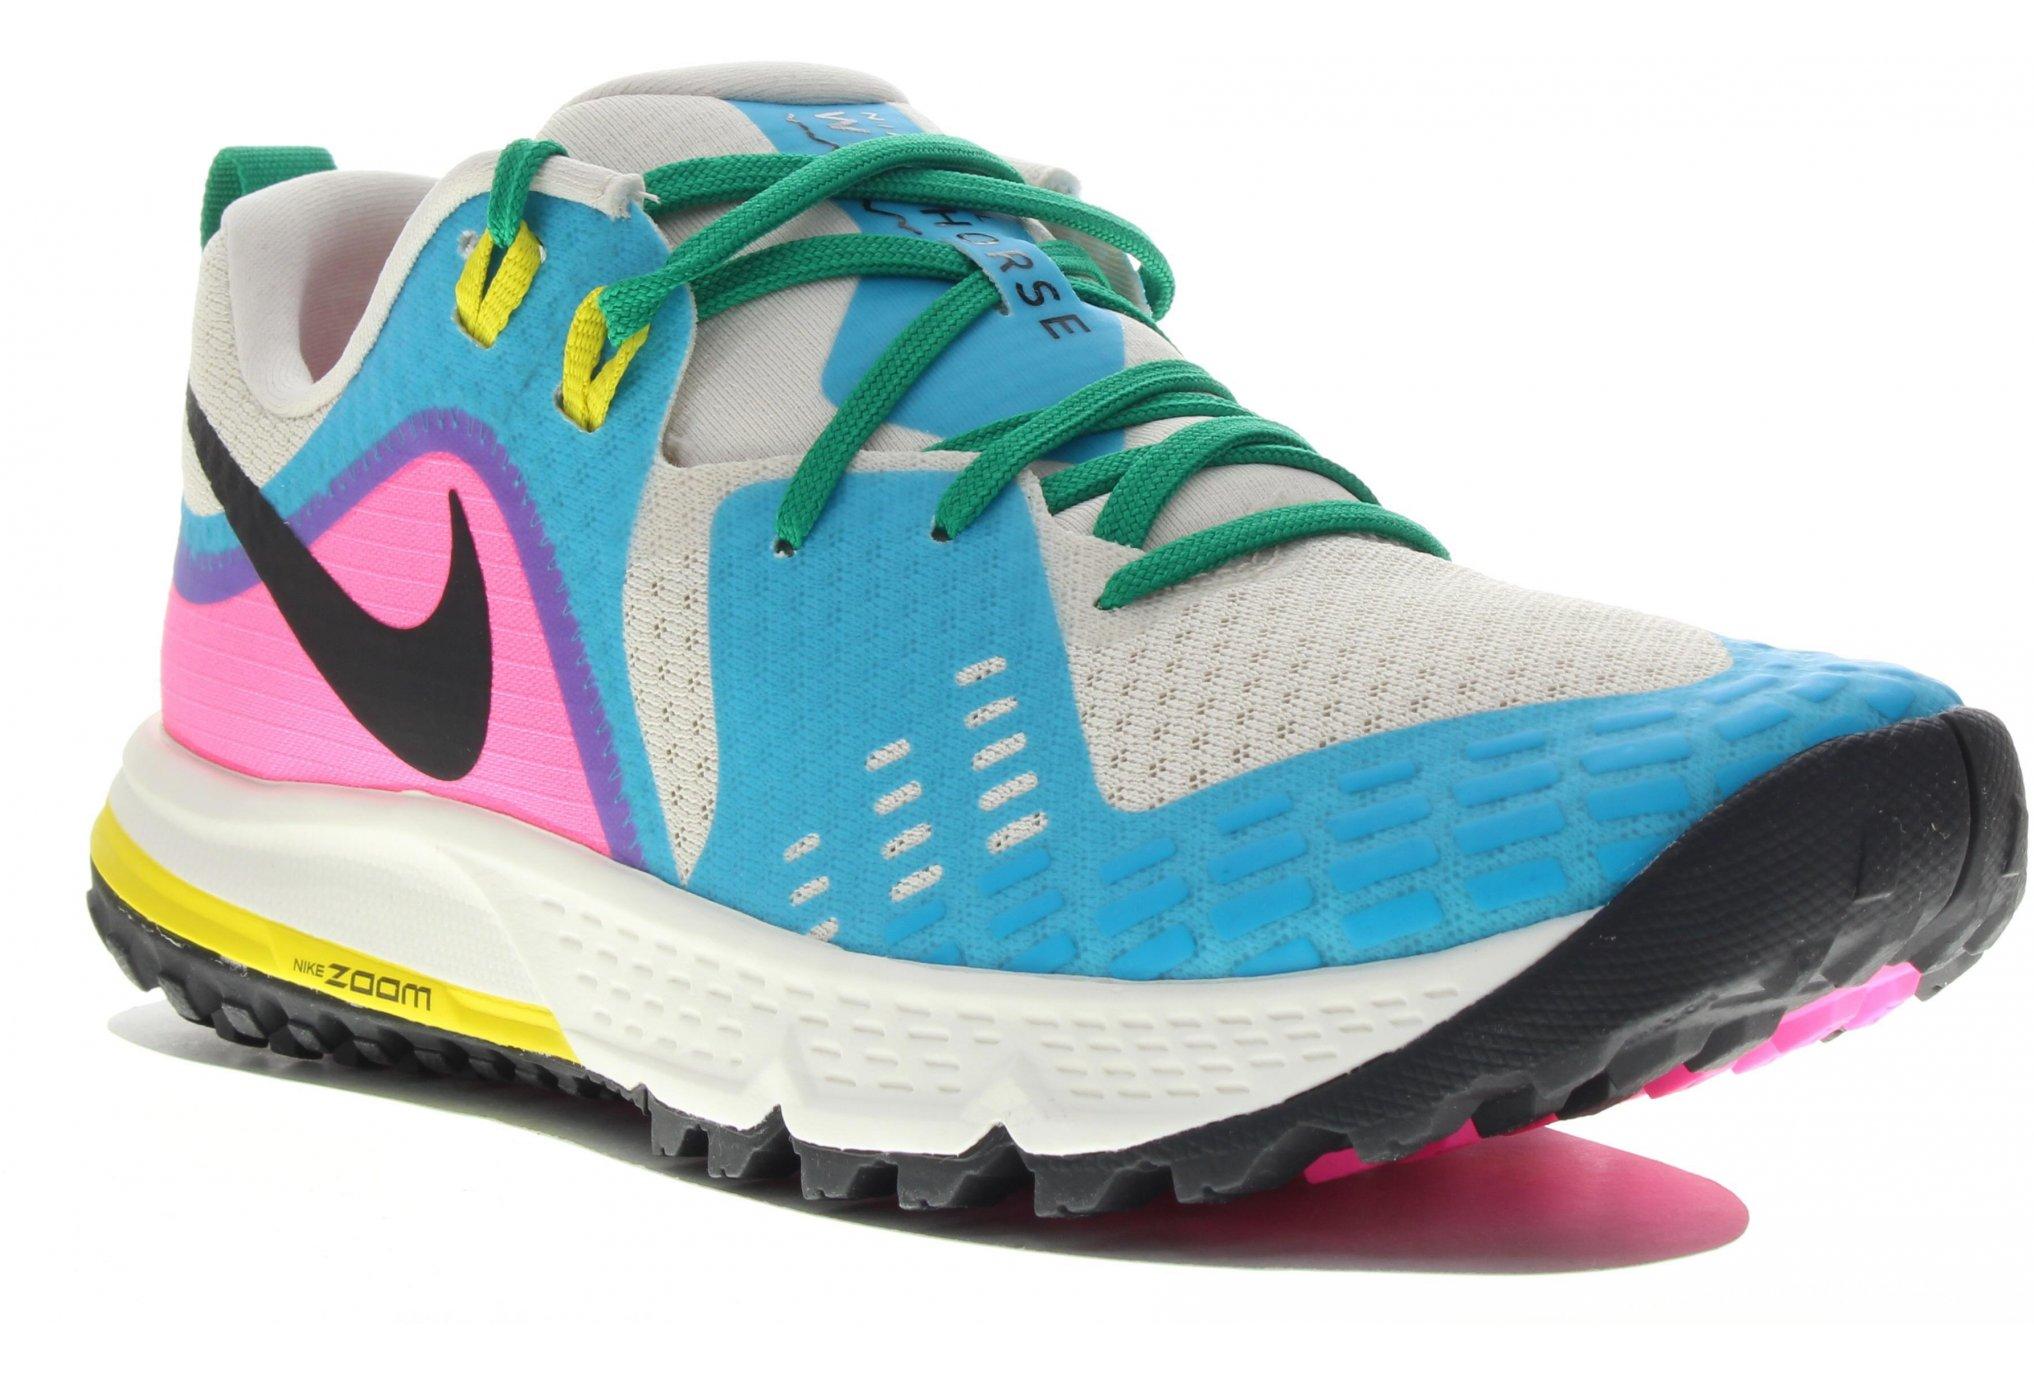 Nike Air Zoom Wildhorse 5 W Chaussures running femme